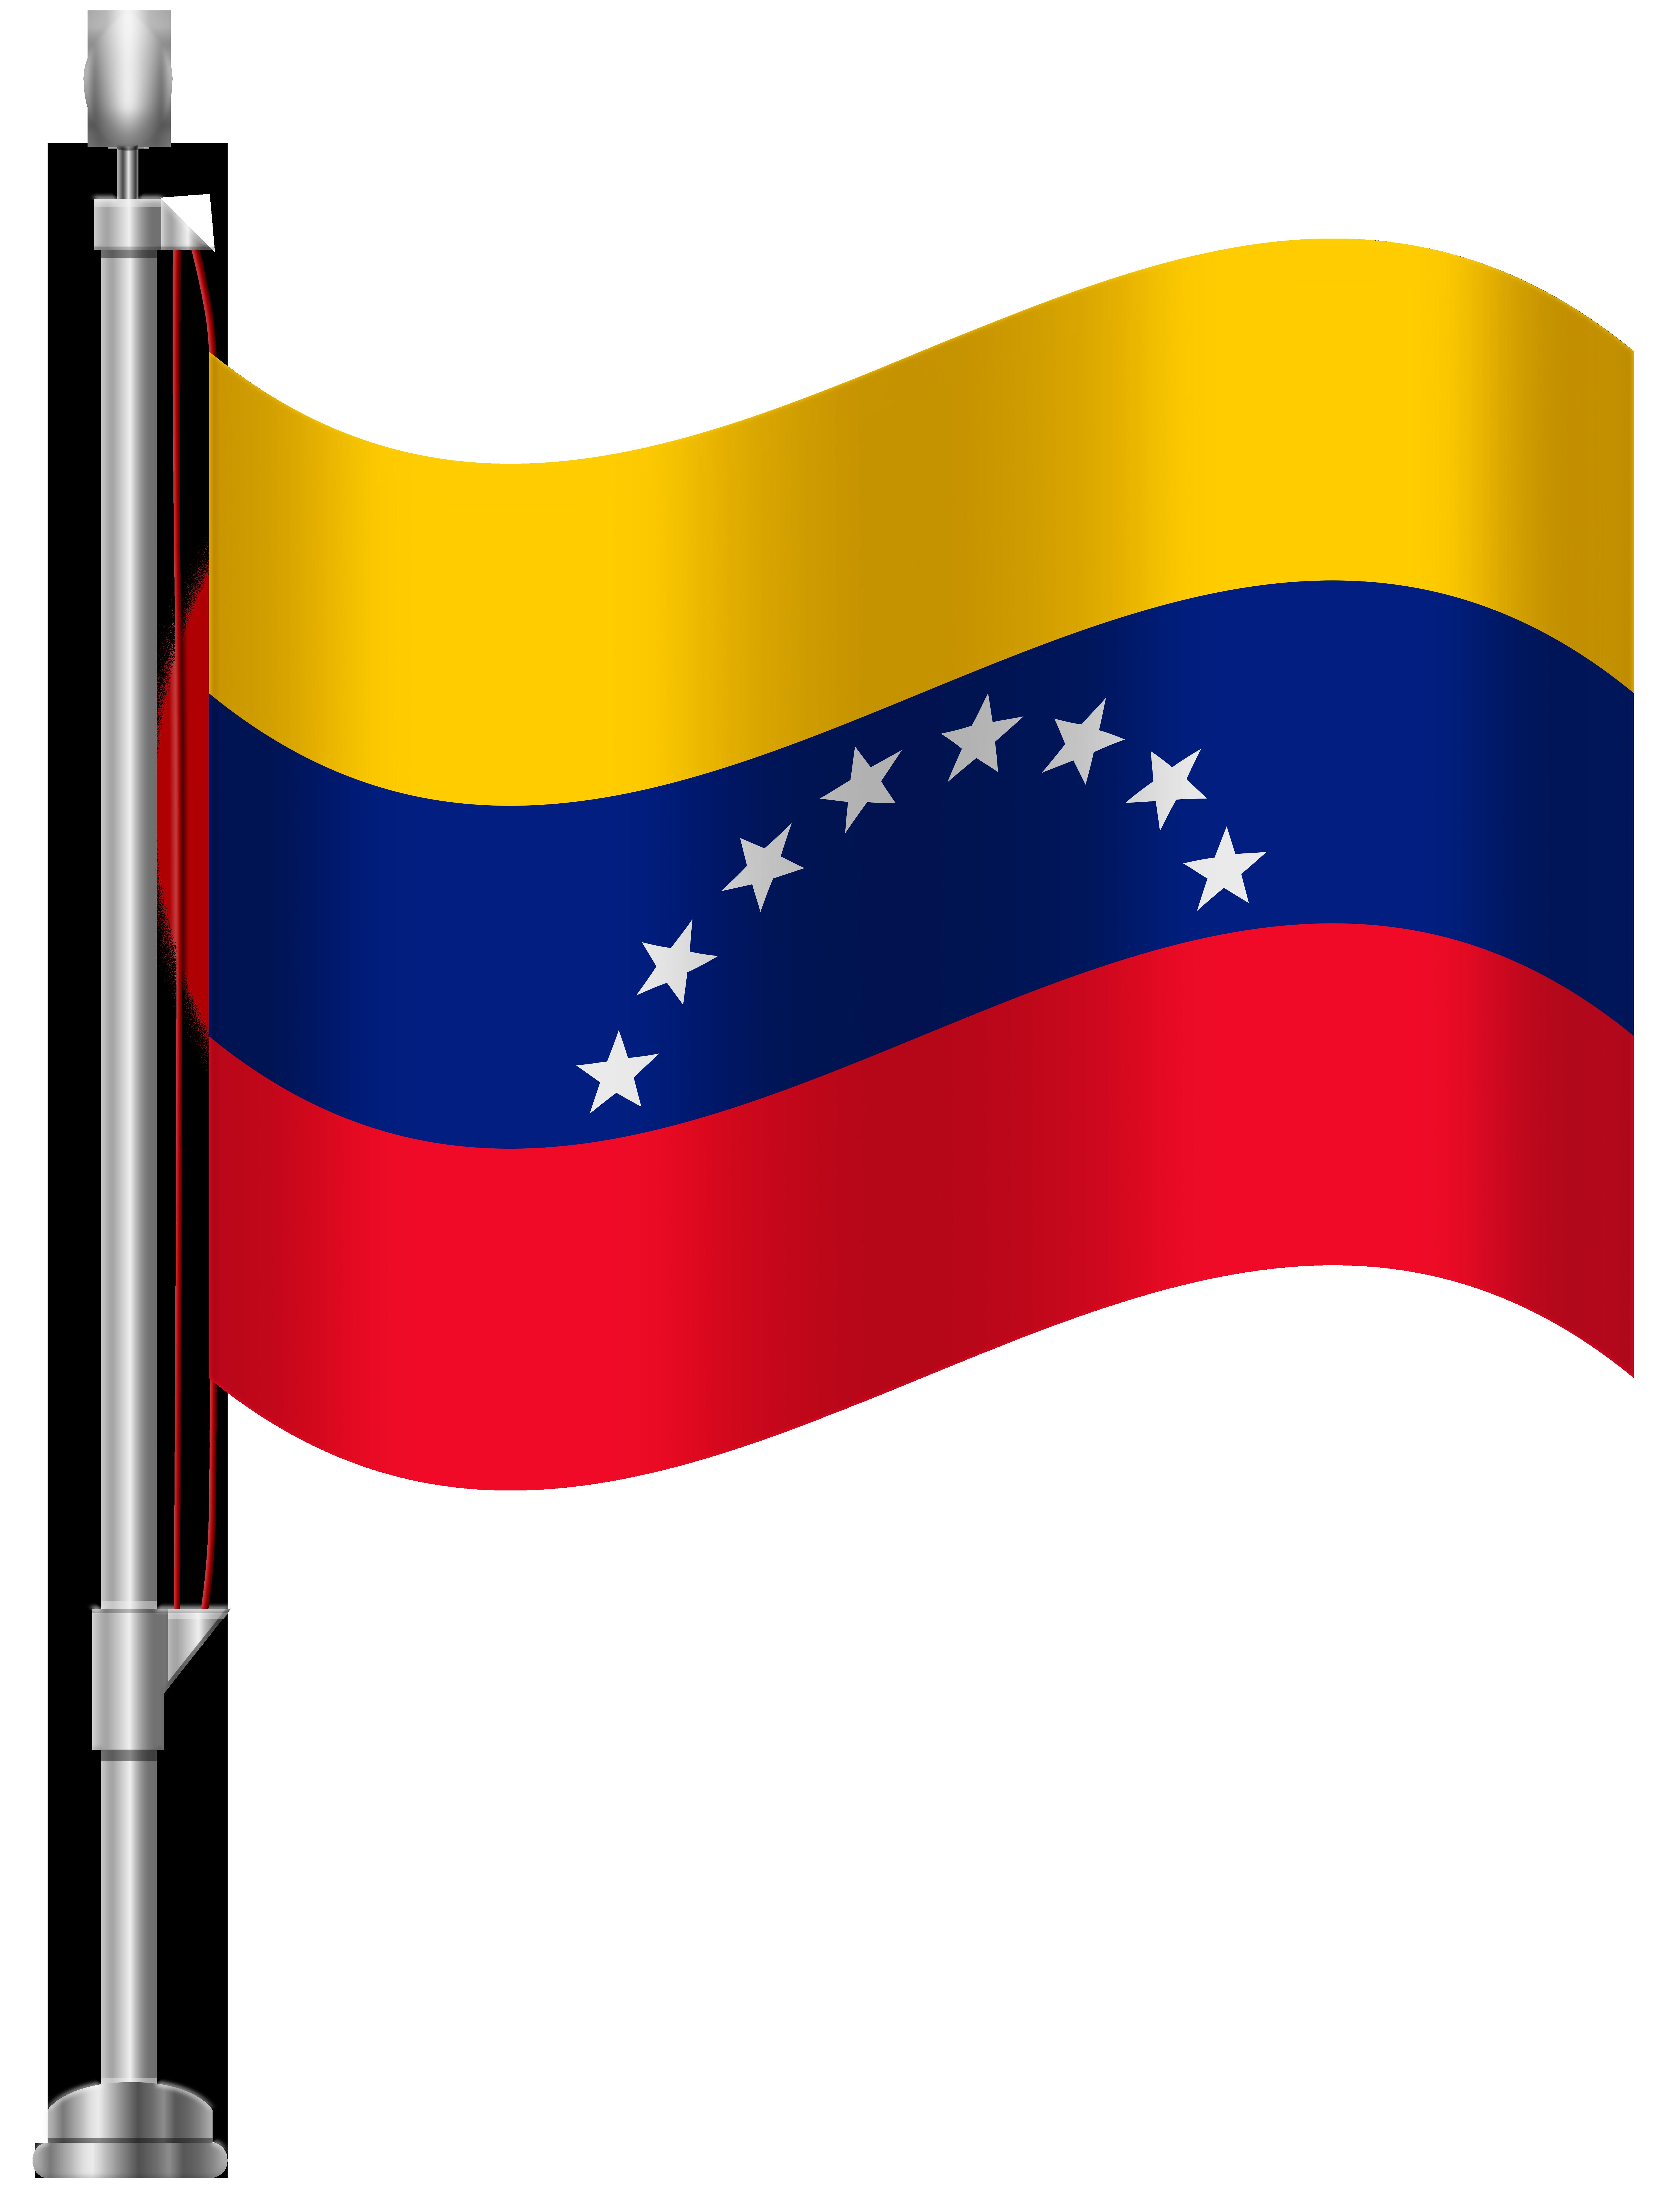 Venezuela flag png clip. Clipart world flags